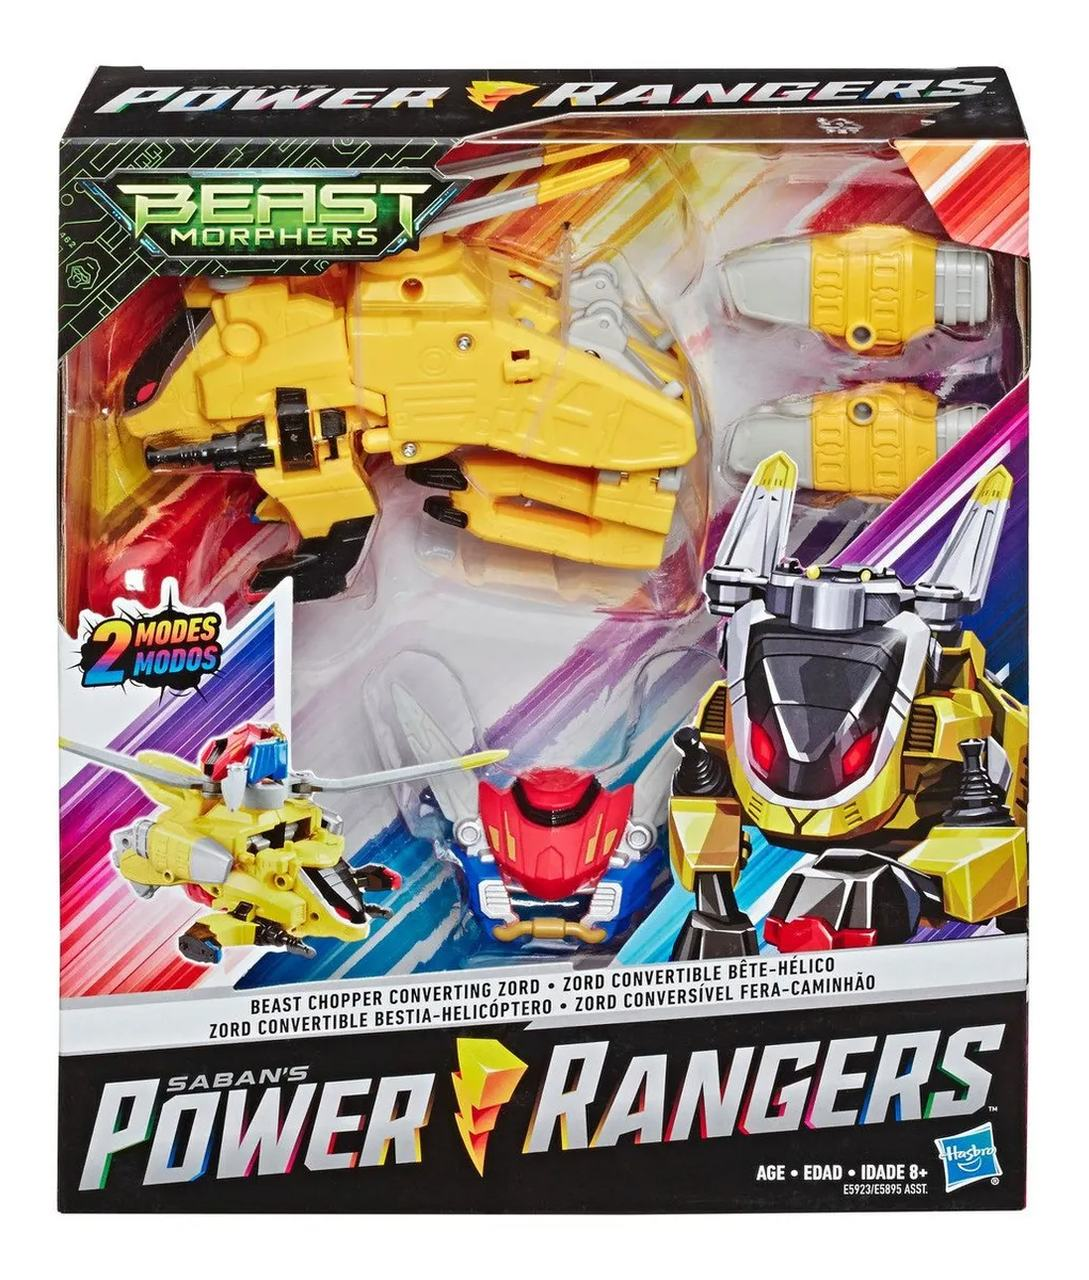 Boneco Power Rangers Zord Conversível Fera-Helicóptero